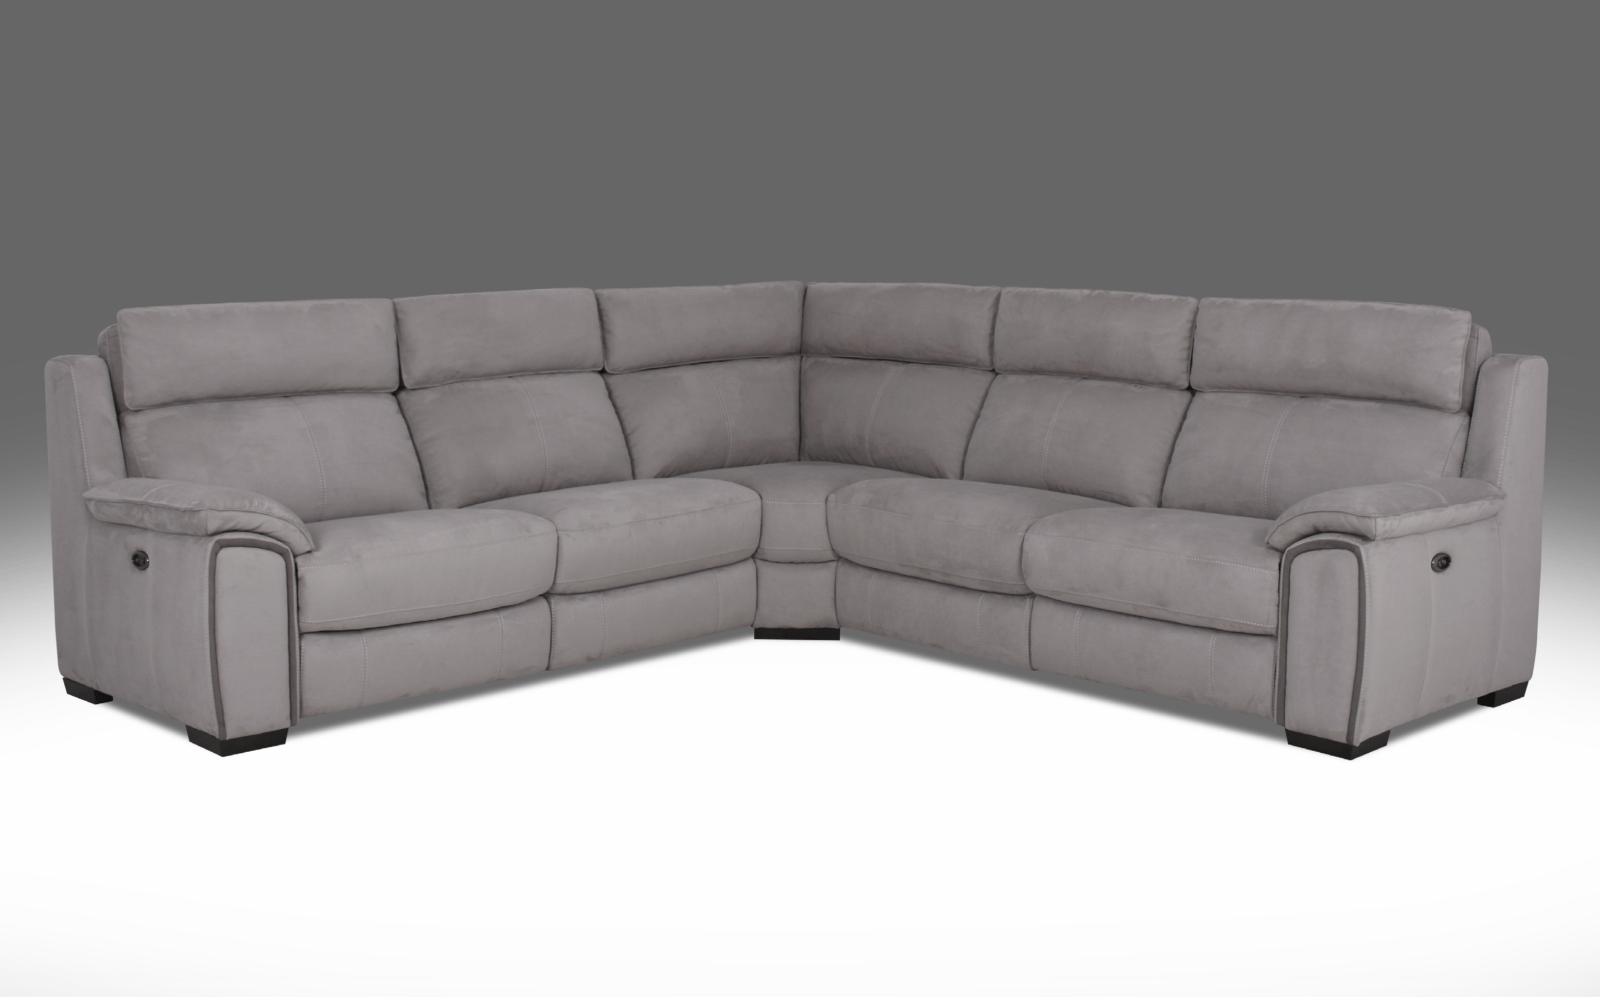 Strange Amalfi Electric Recliner Corner Sofa Dailytribune Chair Design For Home Dailytribuneorg